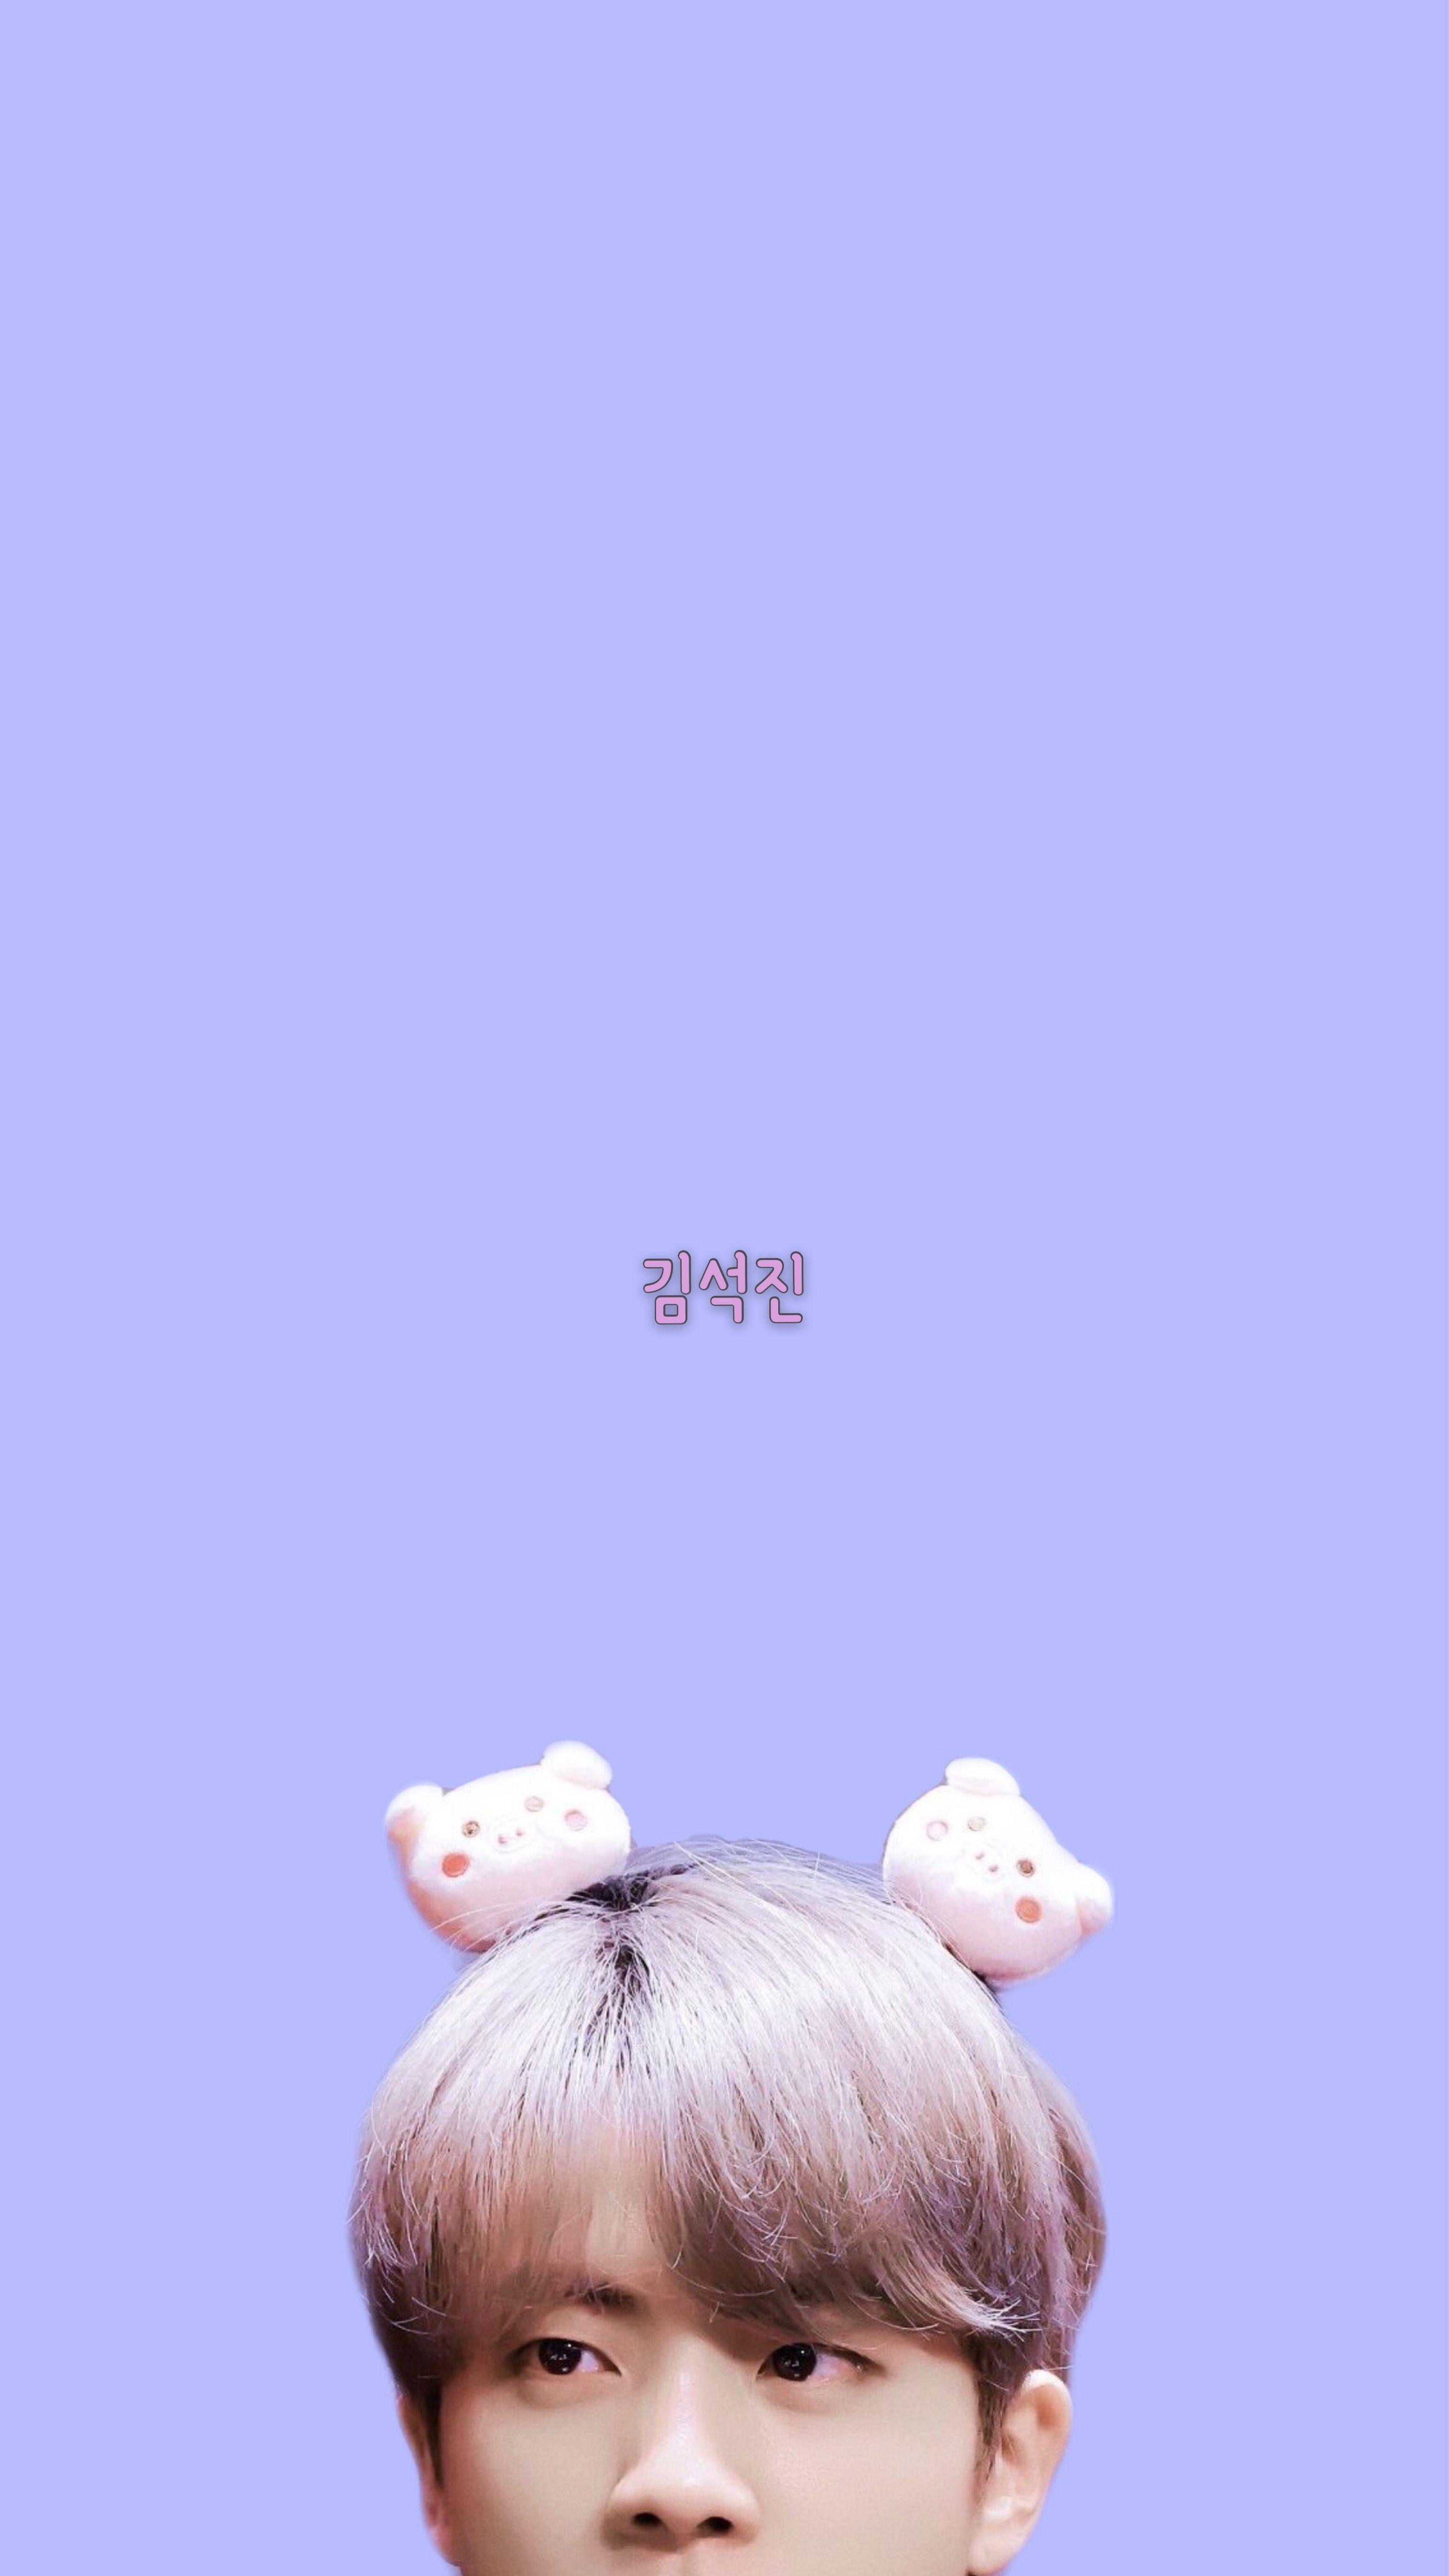 Bts Jin Cute Wallpapers Top Free Bts Jin Cute Backgrounds Wallpaperaccess